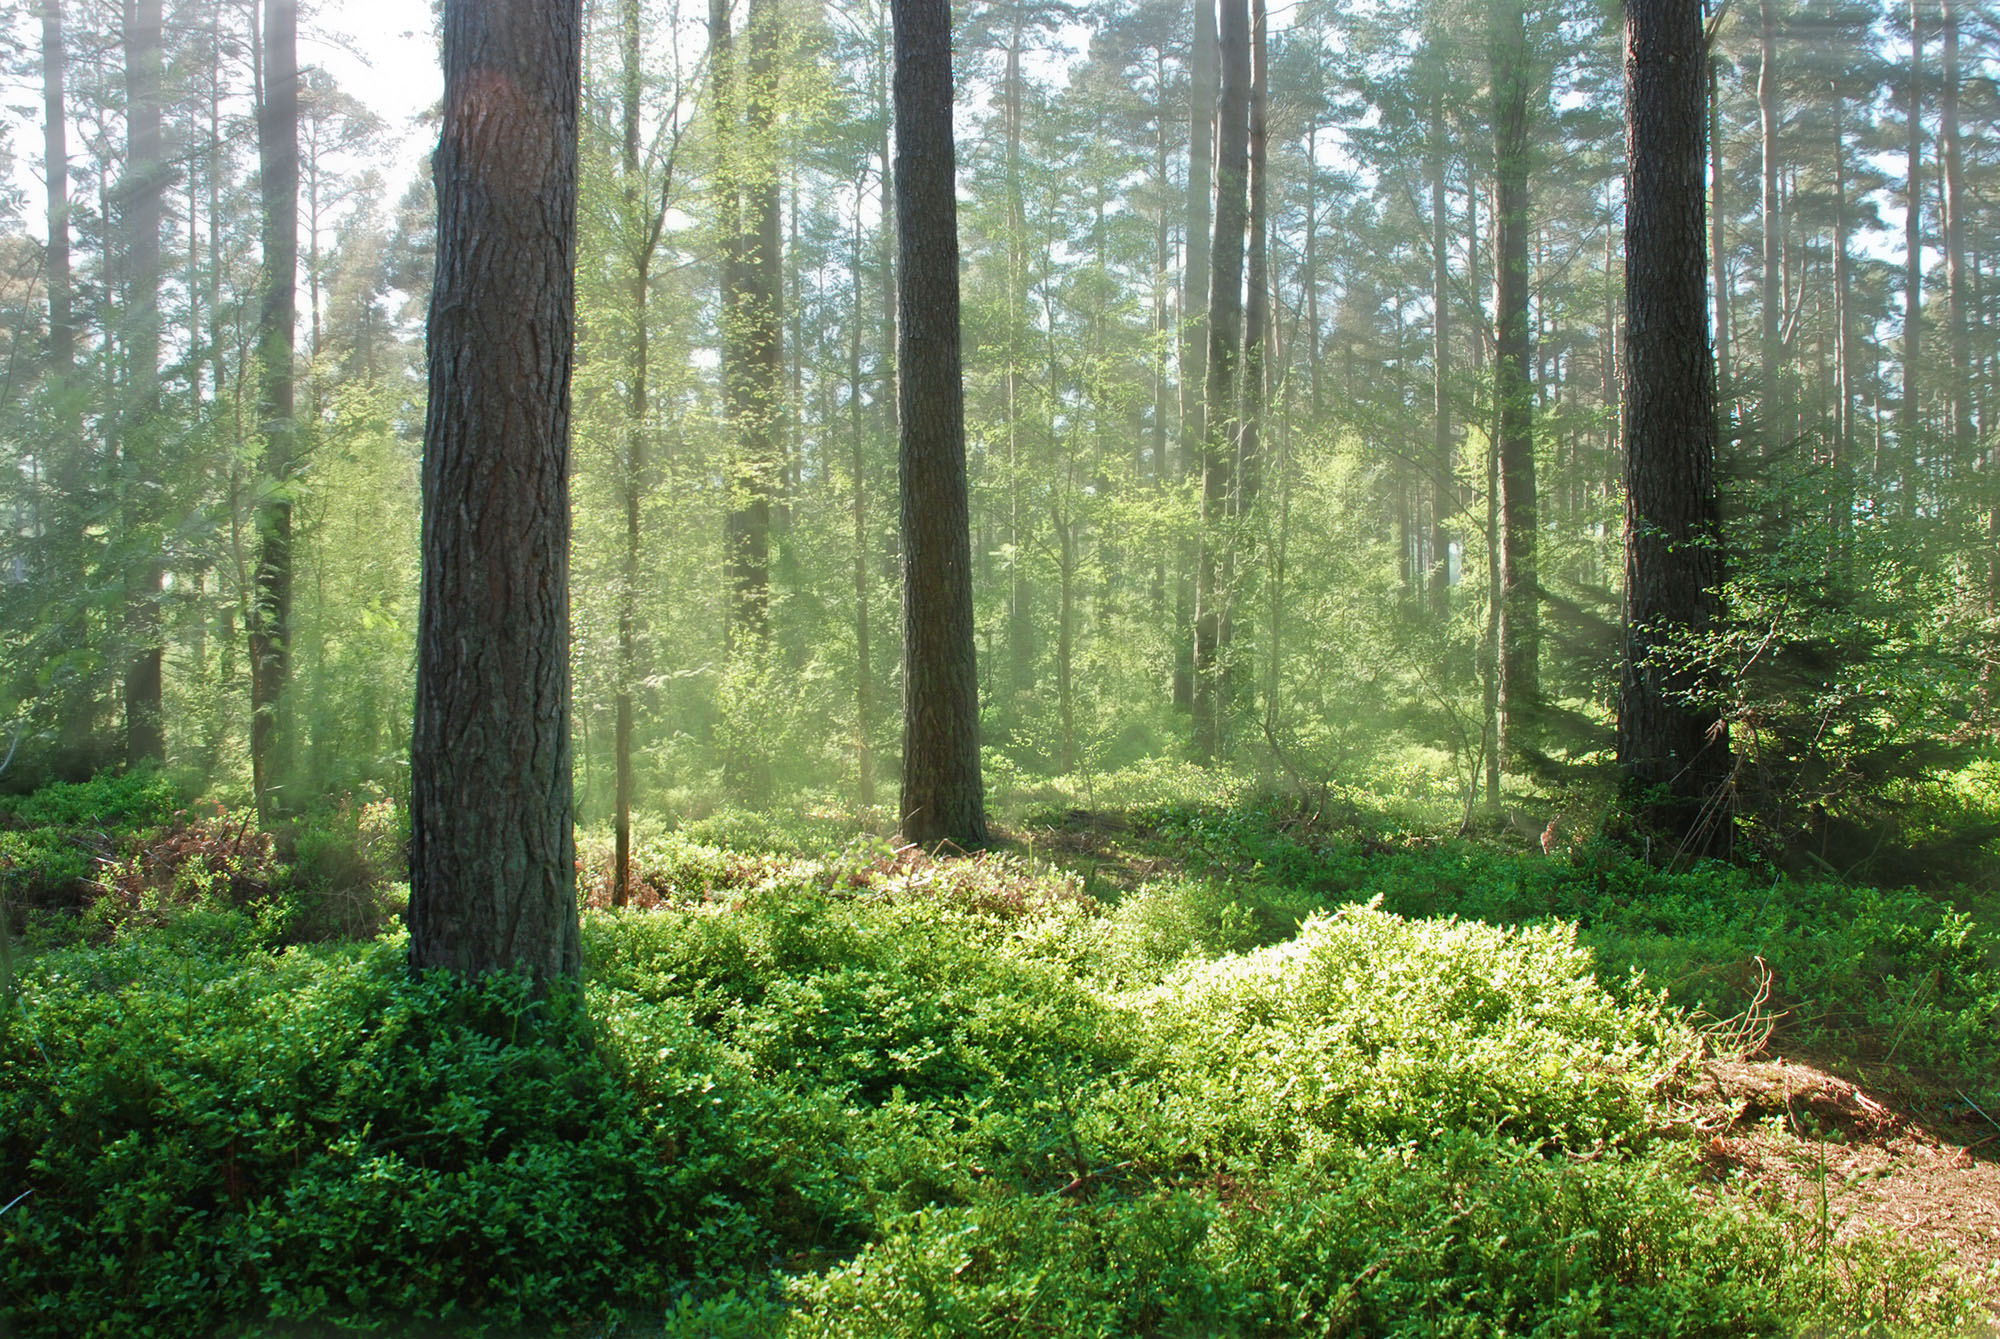 Nature-forrest-threetrees-.jpg